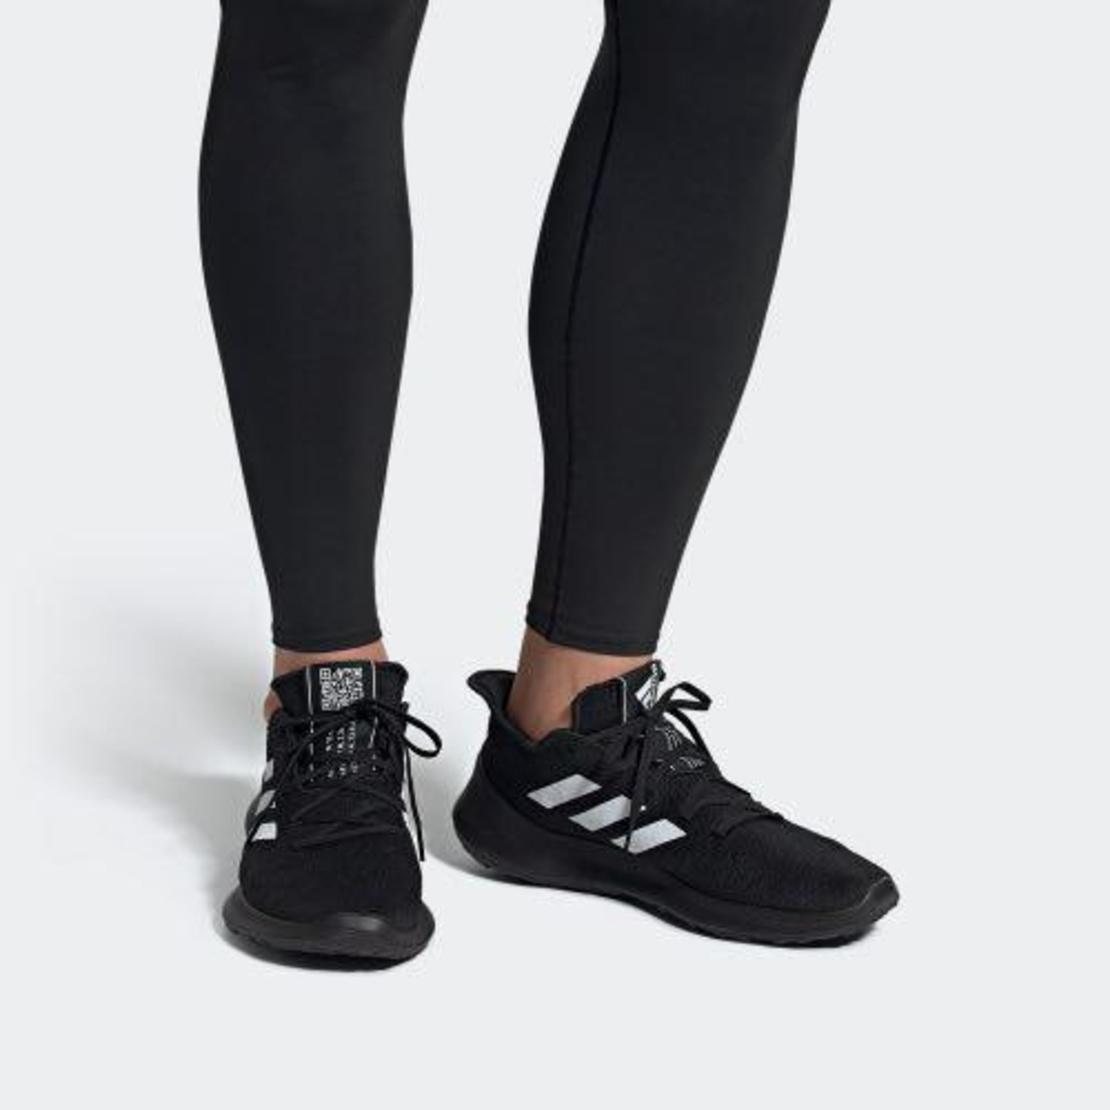 נעלי אדידס לגברים Adidas Sensebounce+ Shoes